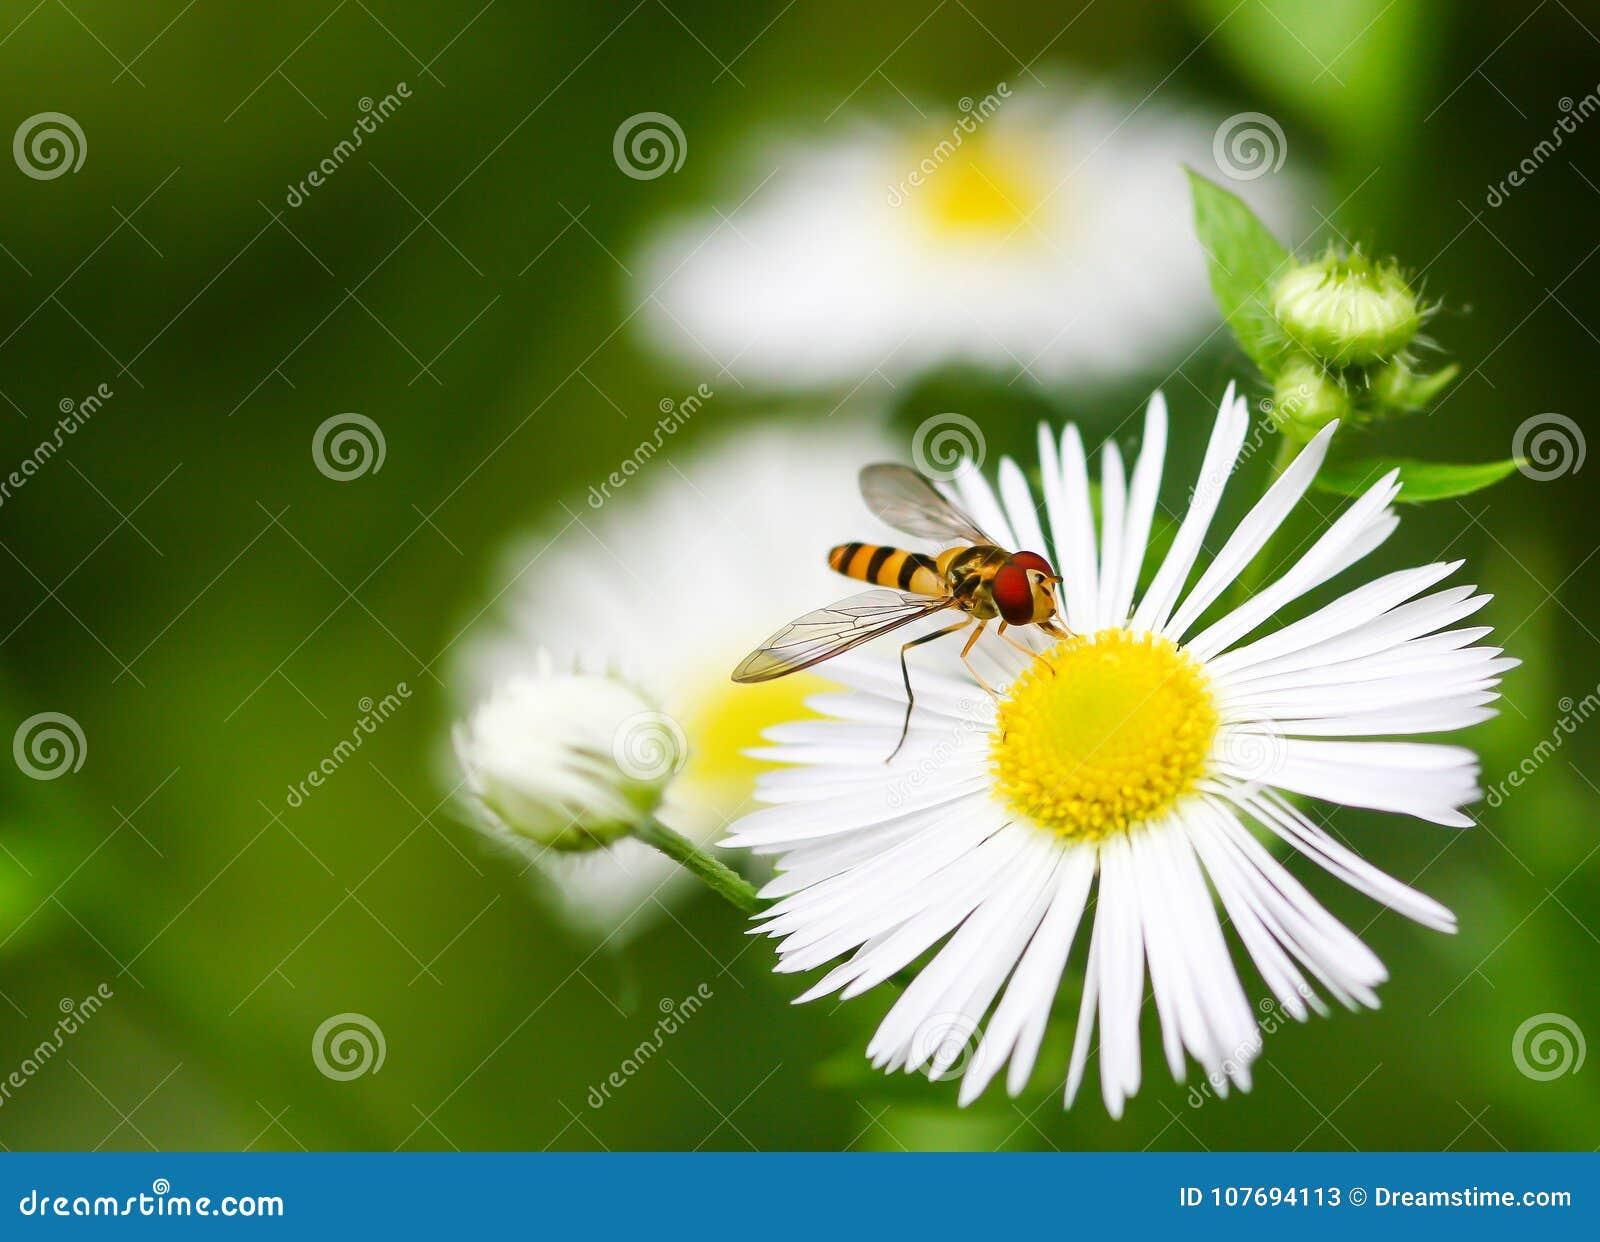 Closeup of a flower fly on a daisy like flower stock image image download closeup of a flower fly on a daisy like flower stock image izmirmasajfo